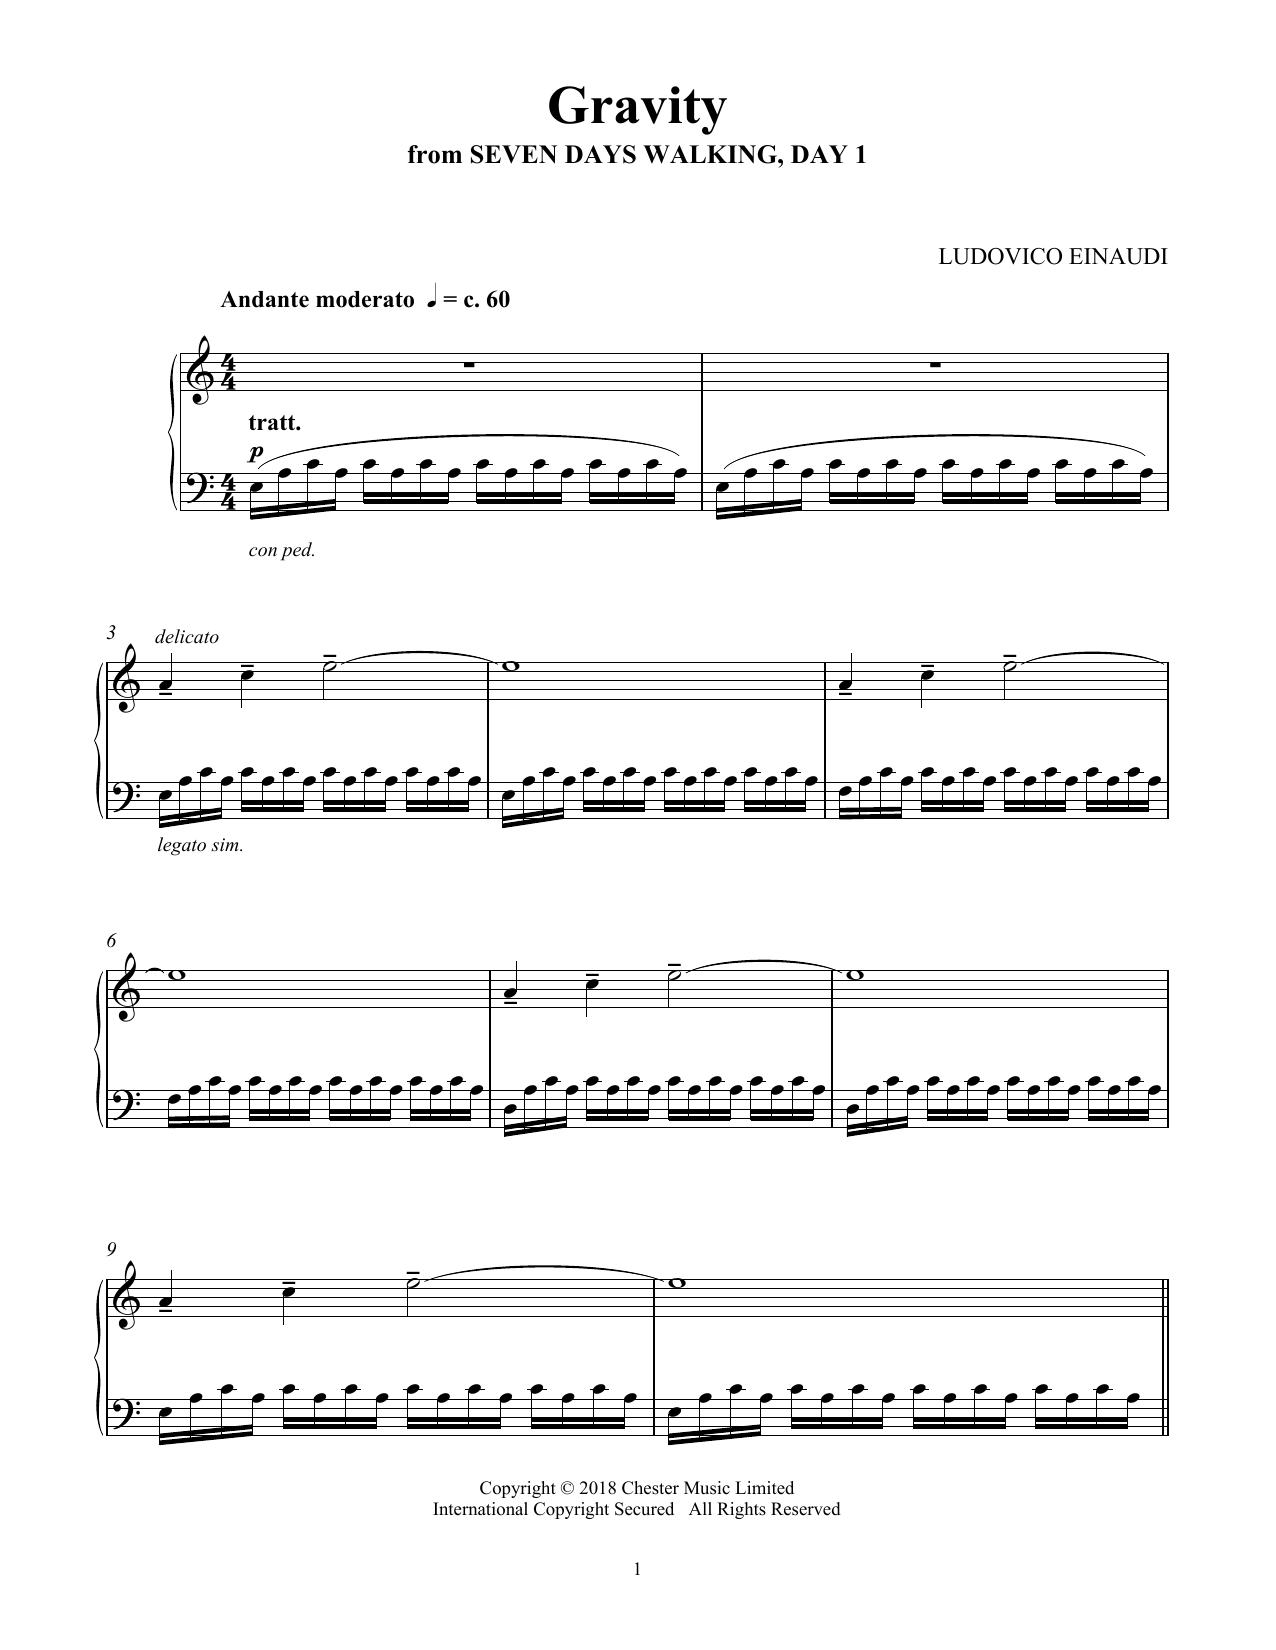 Ludovico Einaudi Gravity From Seven Days Walking Day 1 Sheet Music Notes Chords Score Download Printable Pdf Sheet Music Sheet Music Notes Digital Sheet Music